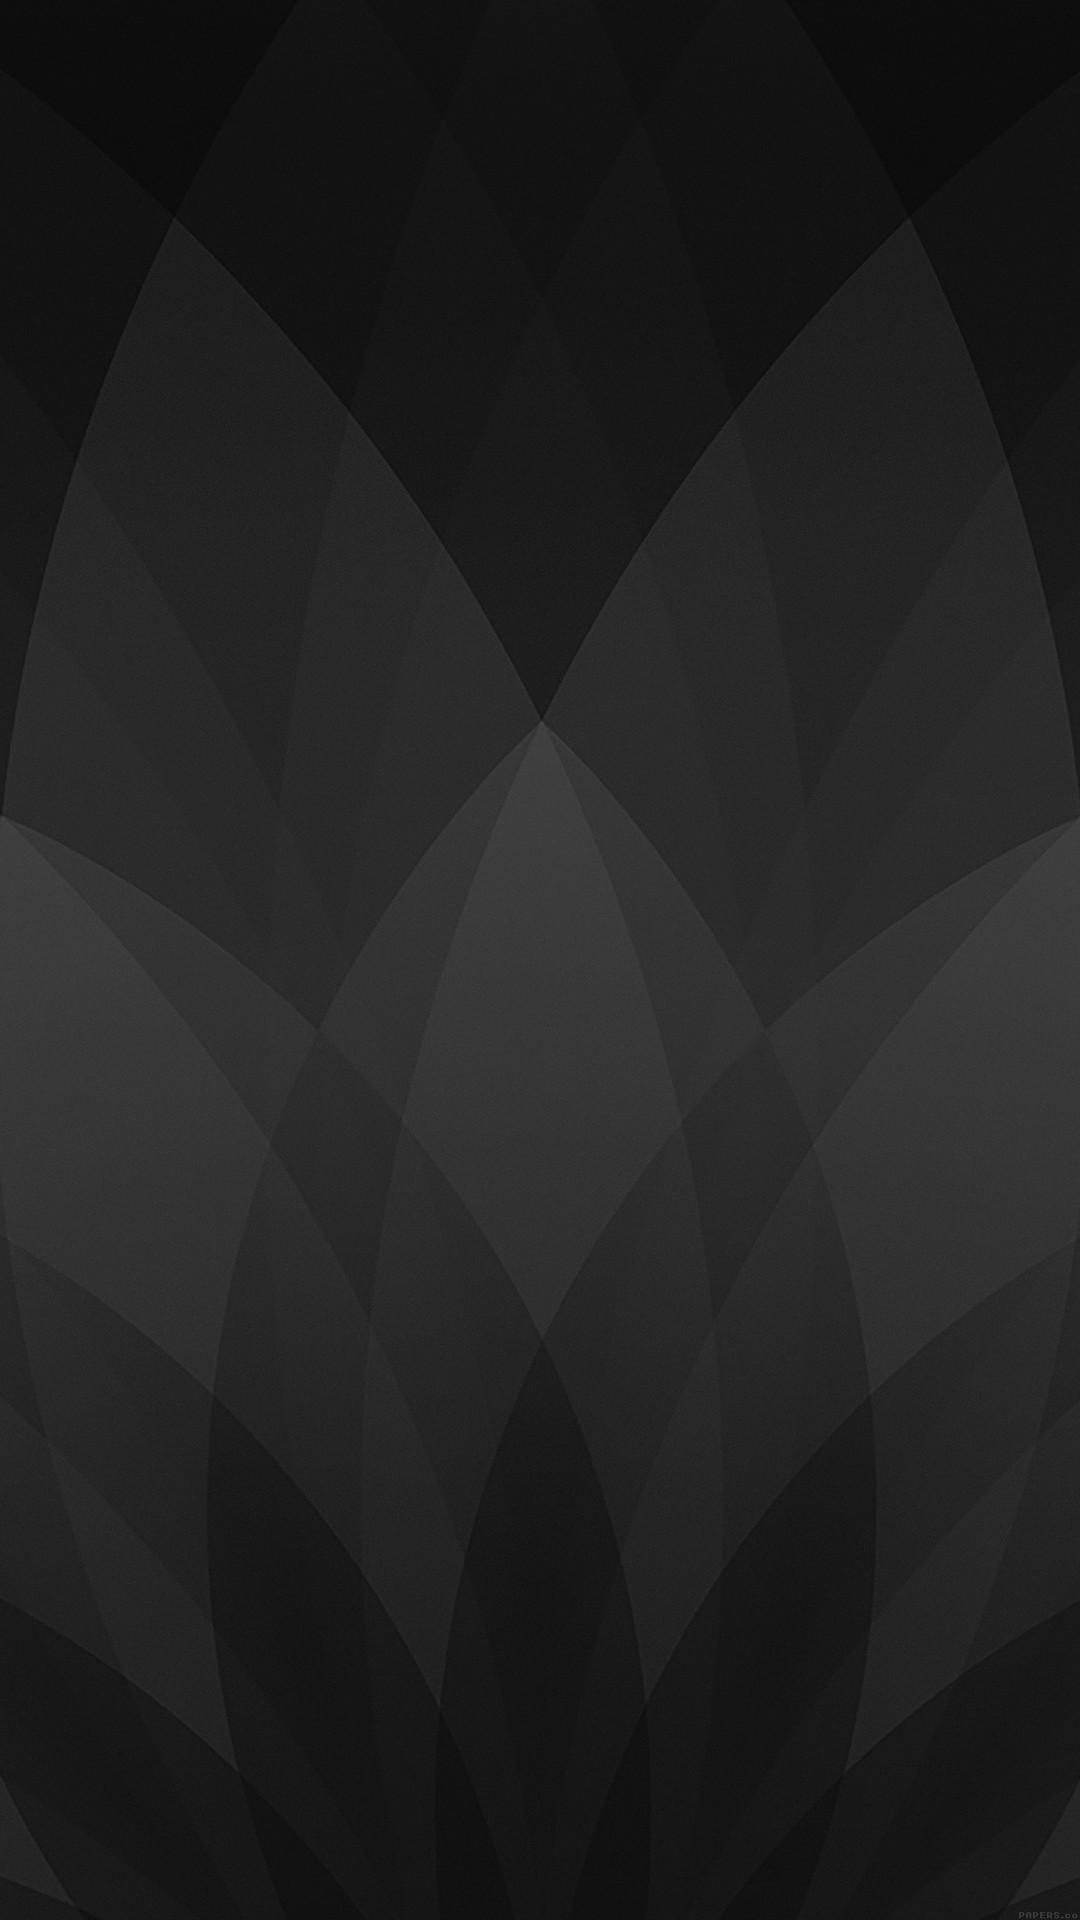 Gray iphone home screen wallpaper